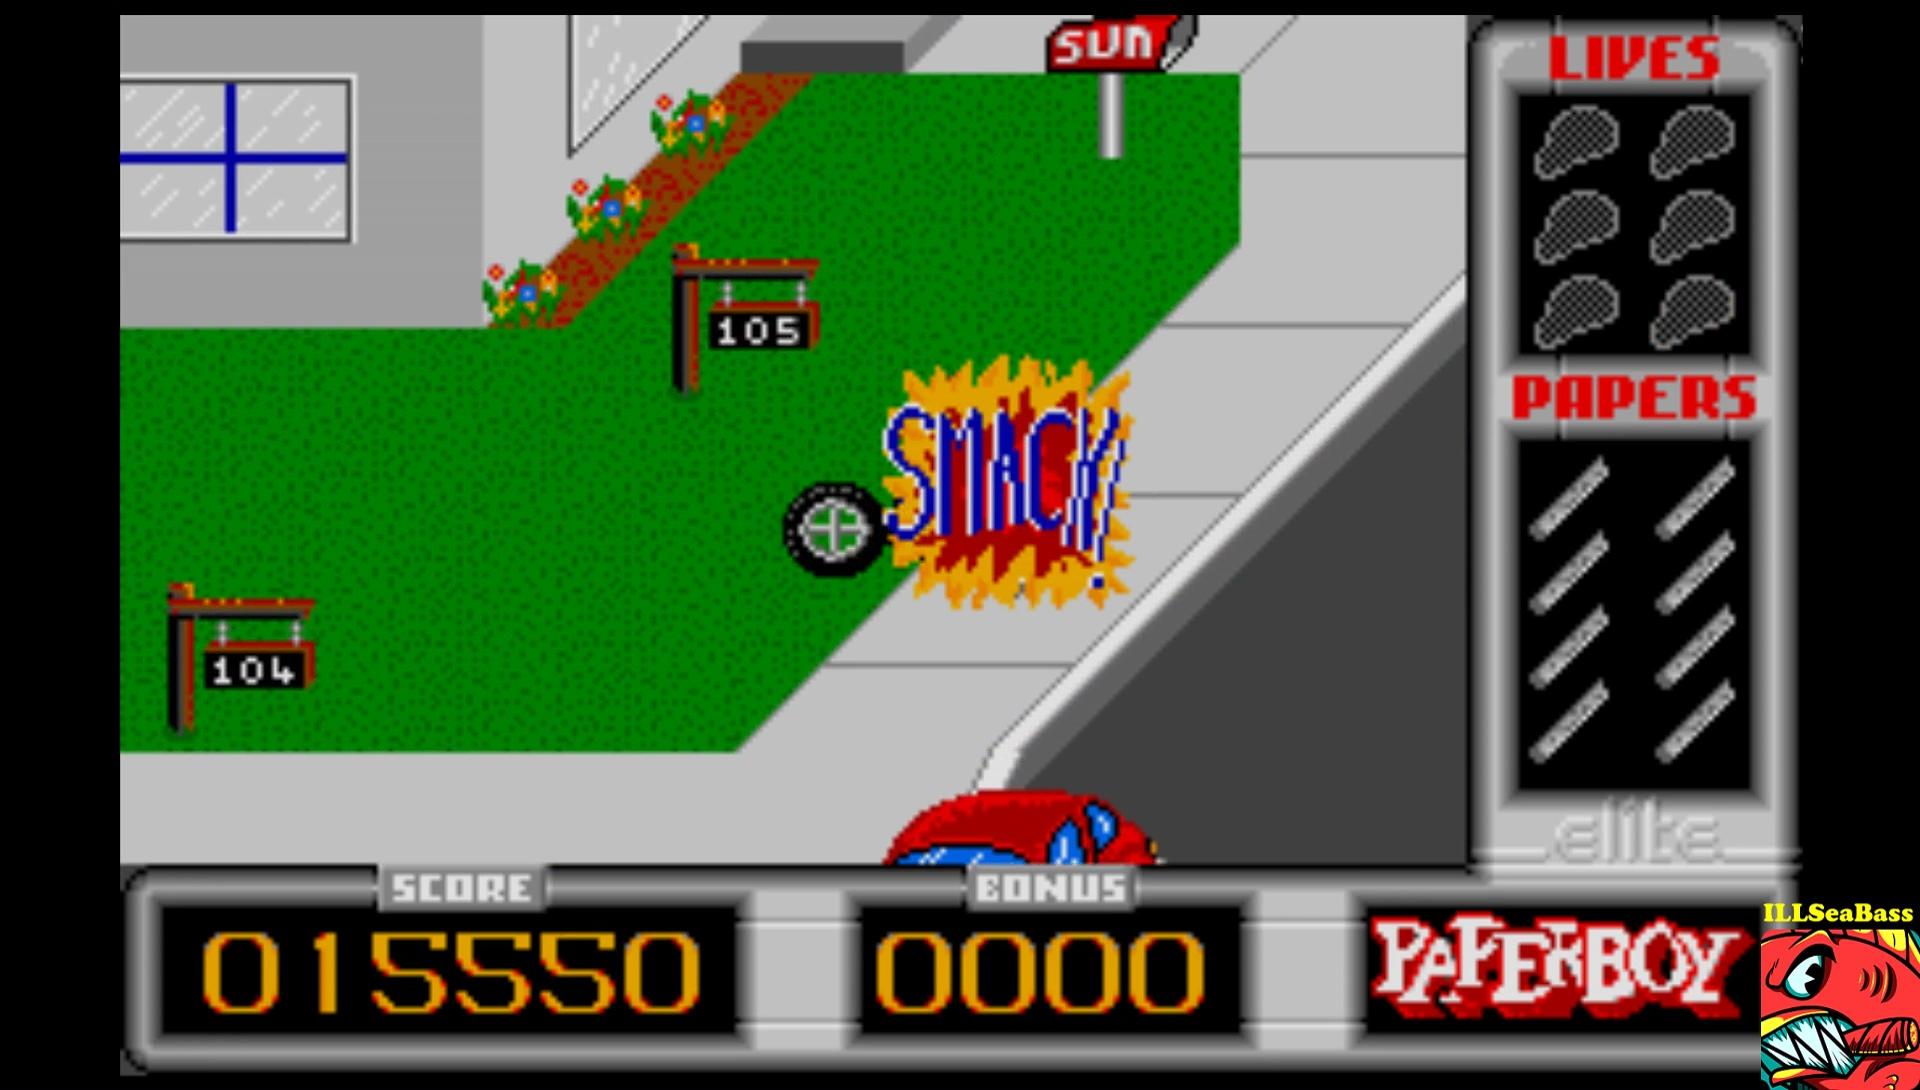 ILLSeaBass: Paperboy [Easy Street] (Atari ST Emulated) 15,550 points on 2017-03-04 22:22:07